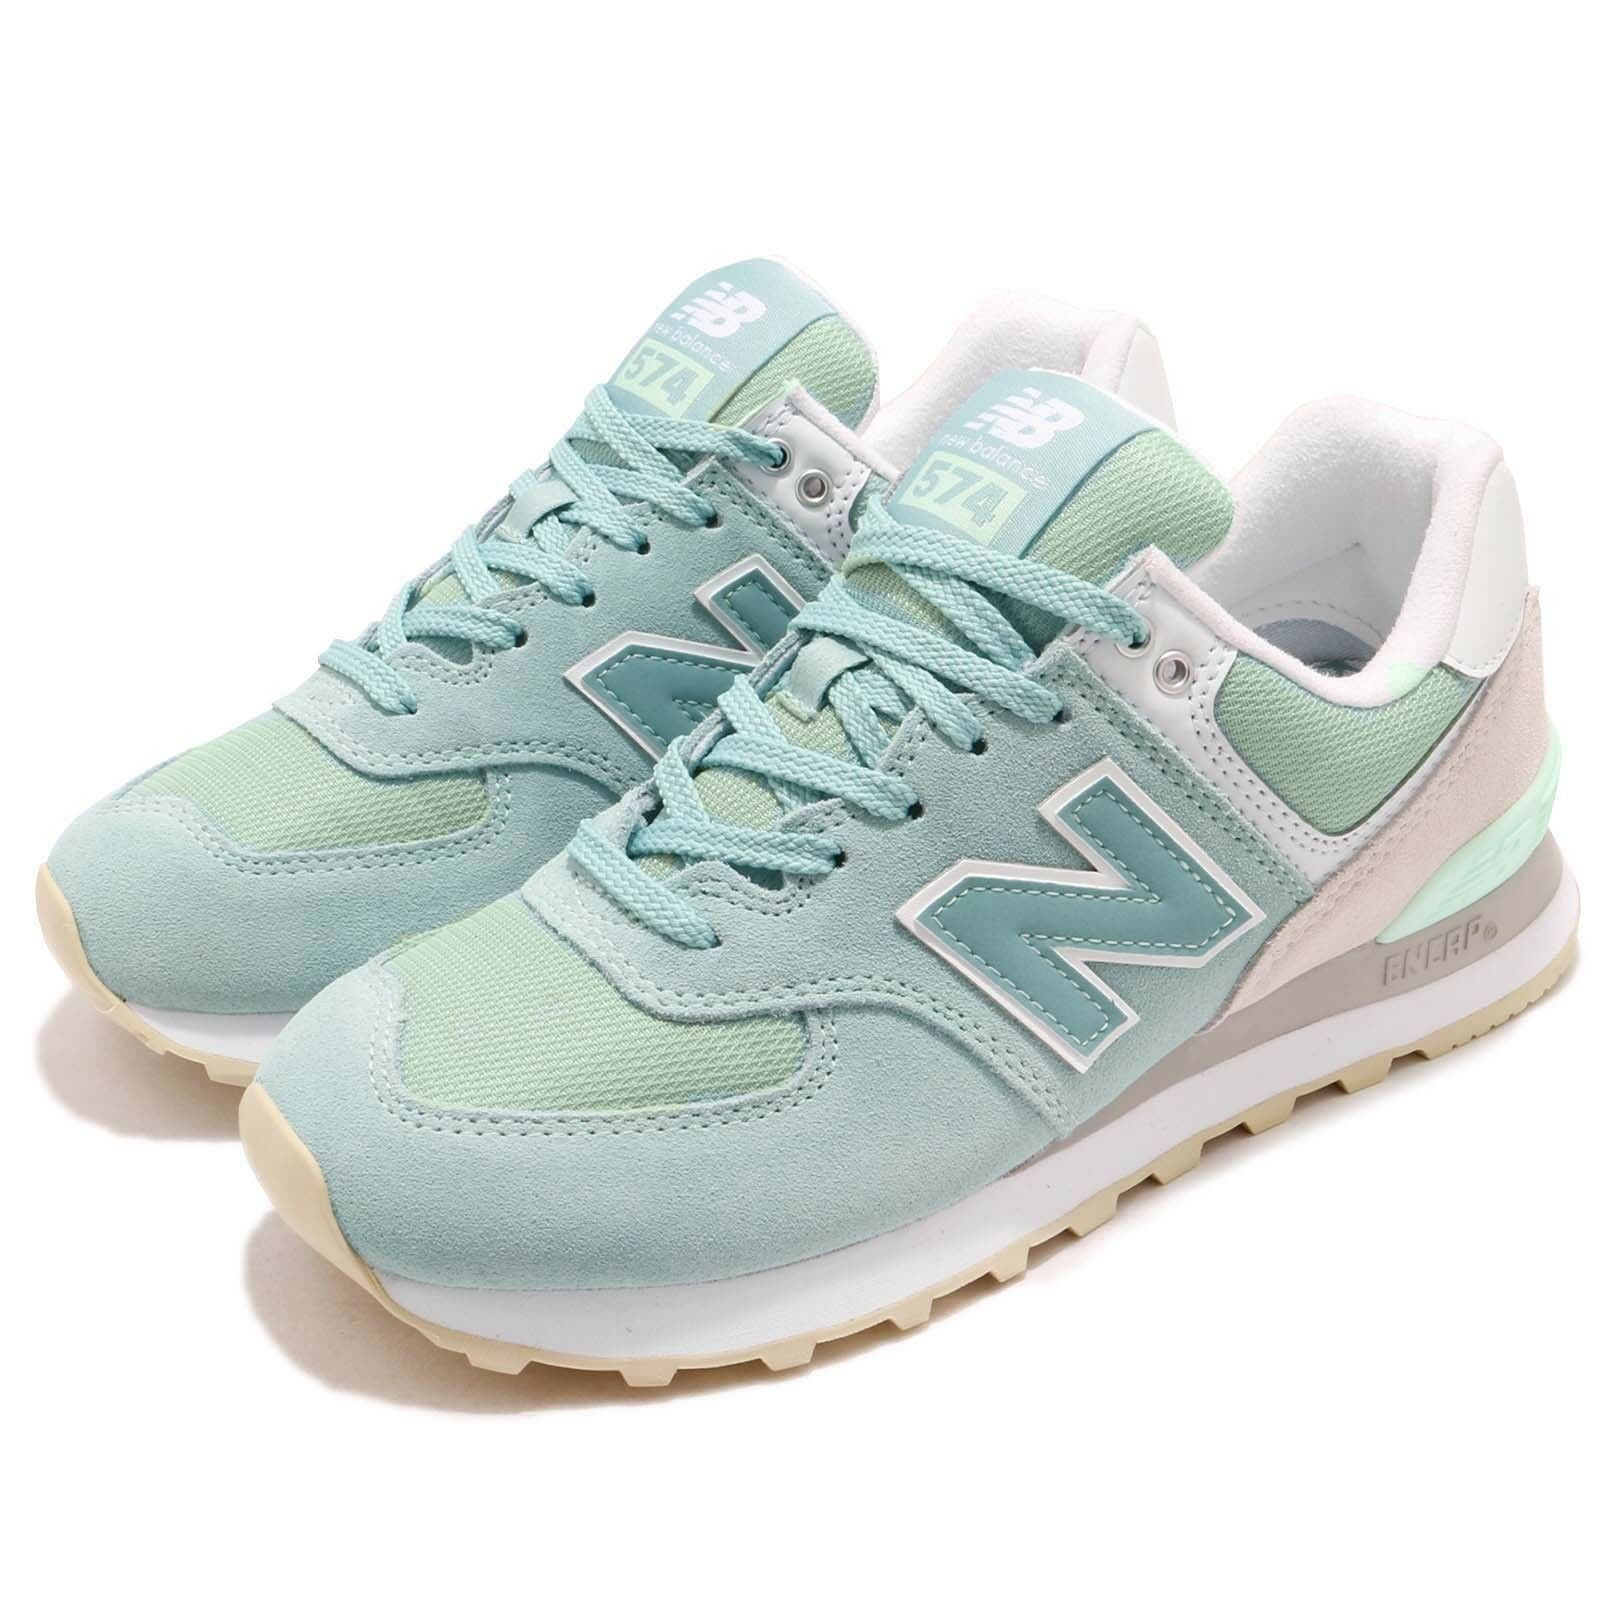 New Balance WL574TAB B Green Grey White Women Running shoes  Sneakers WL574TABB  promotions